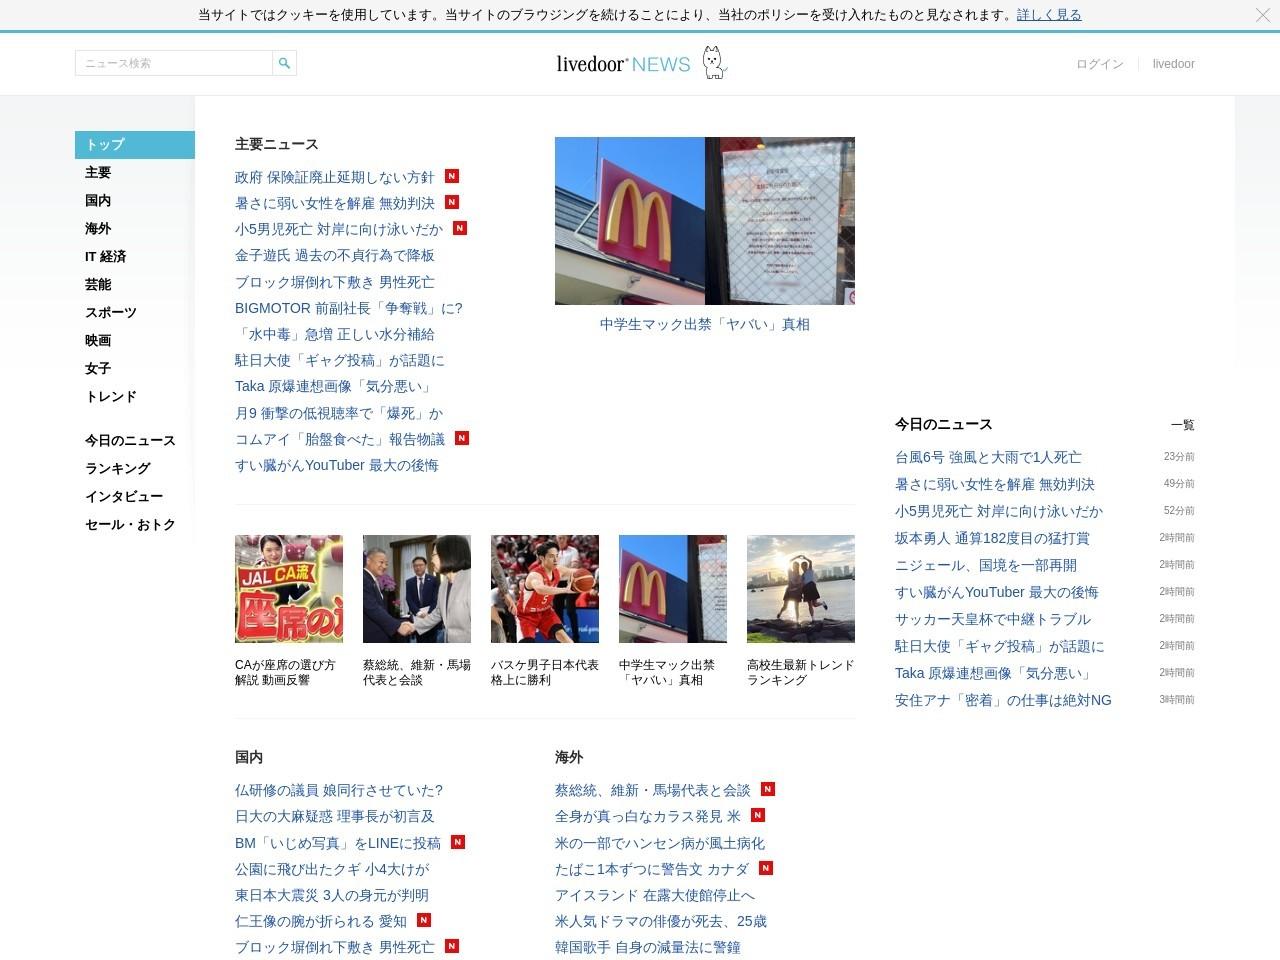 http://news.livedoor.com/webapp/journal/cid__2739160/detailのプレビュー画像